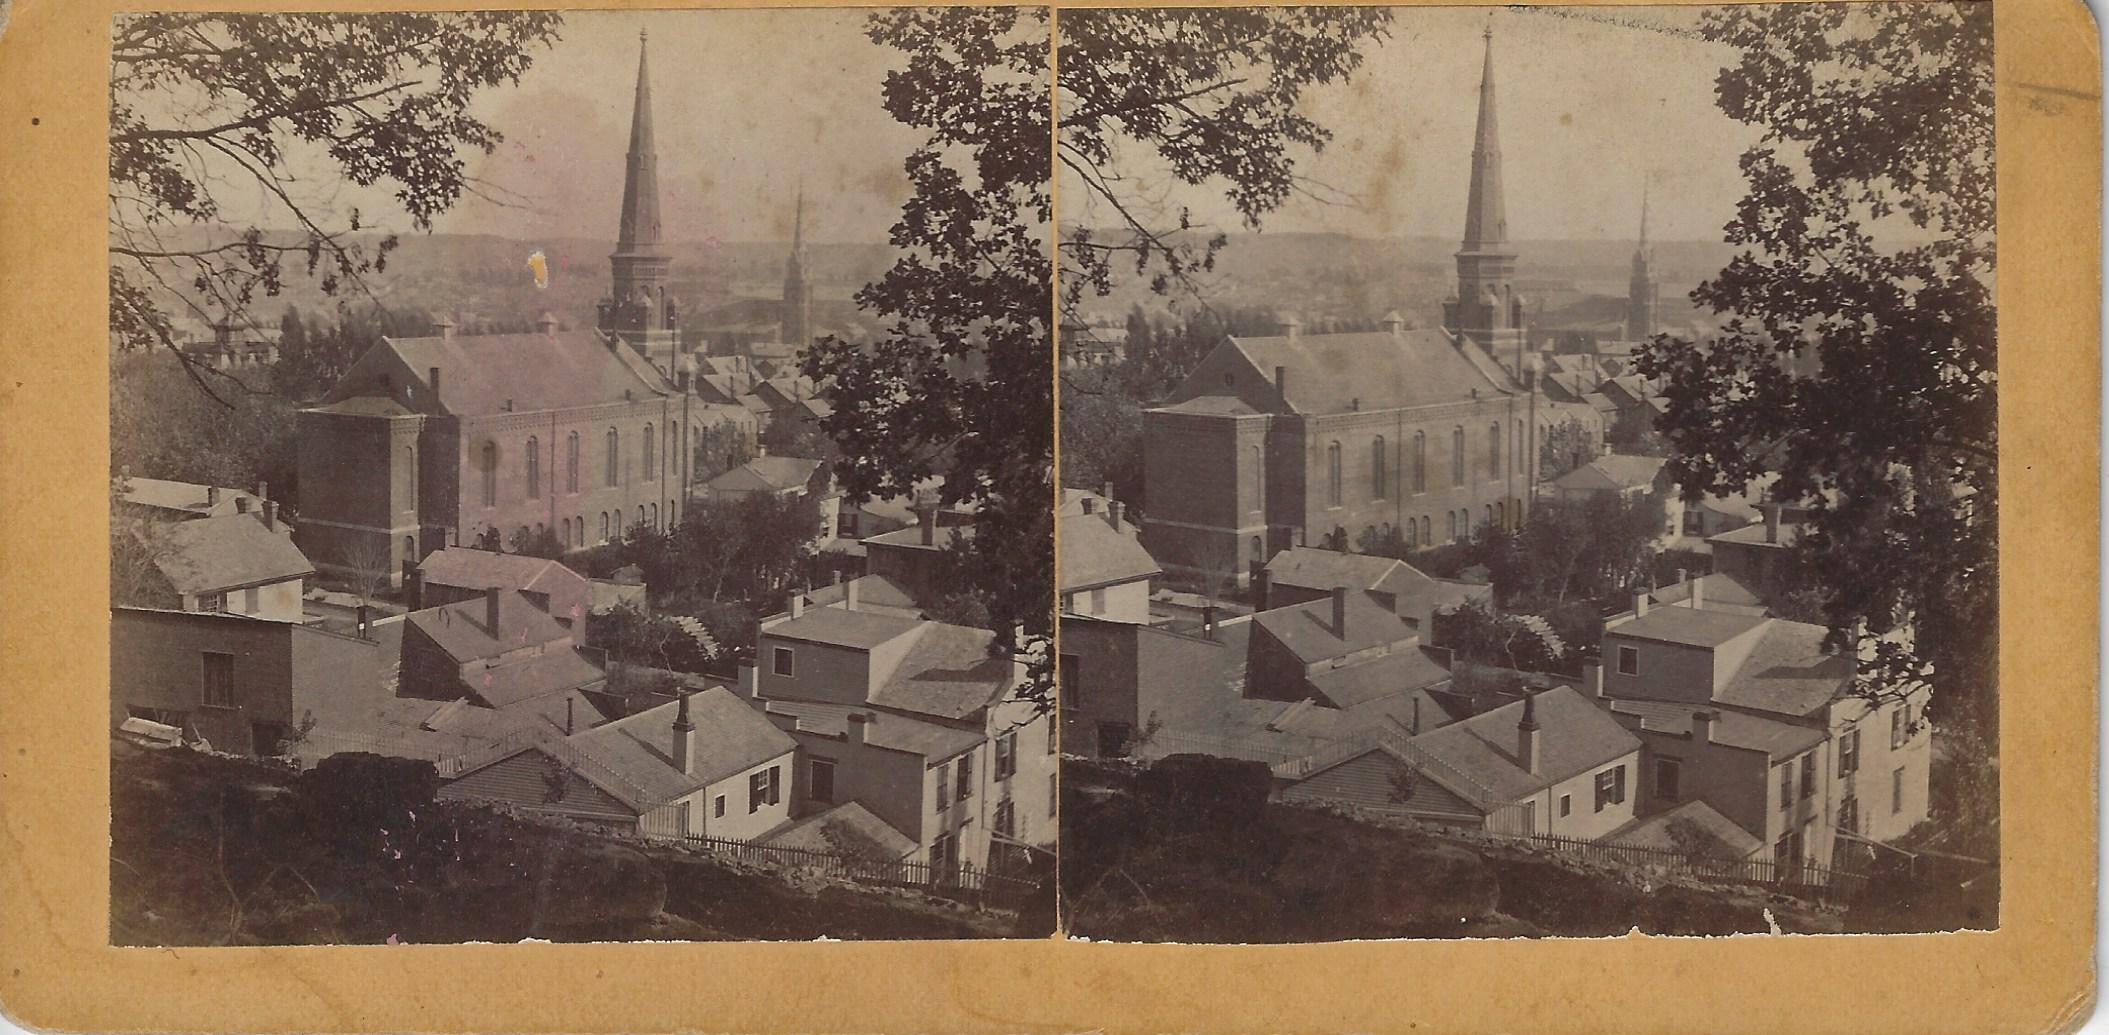 LJTP 100.301 - Westminster Presbyterian Church - 13th & Locust - c1880